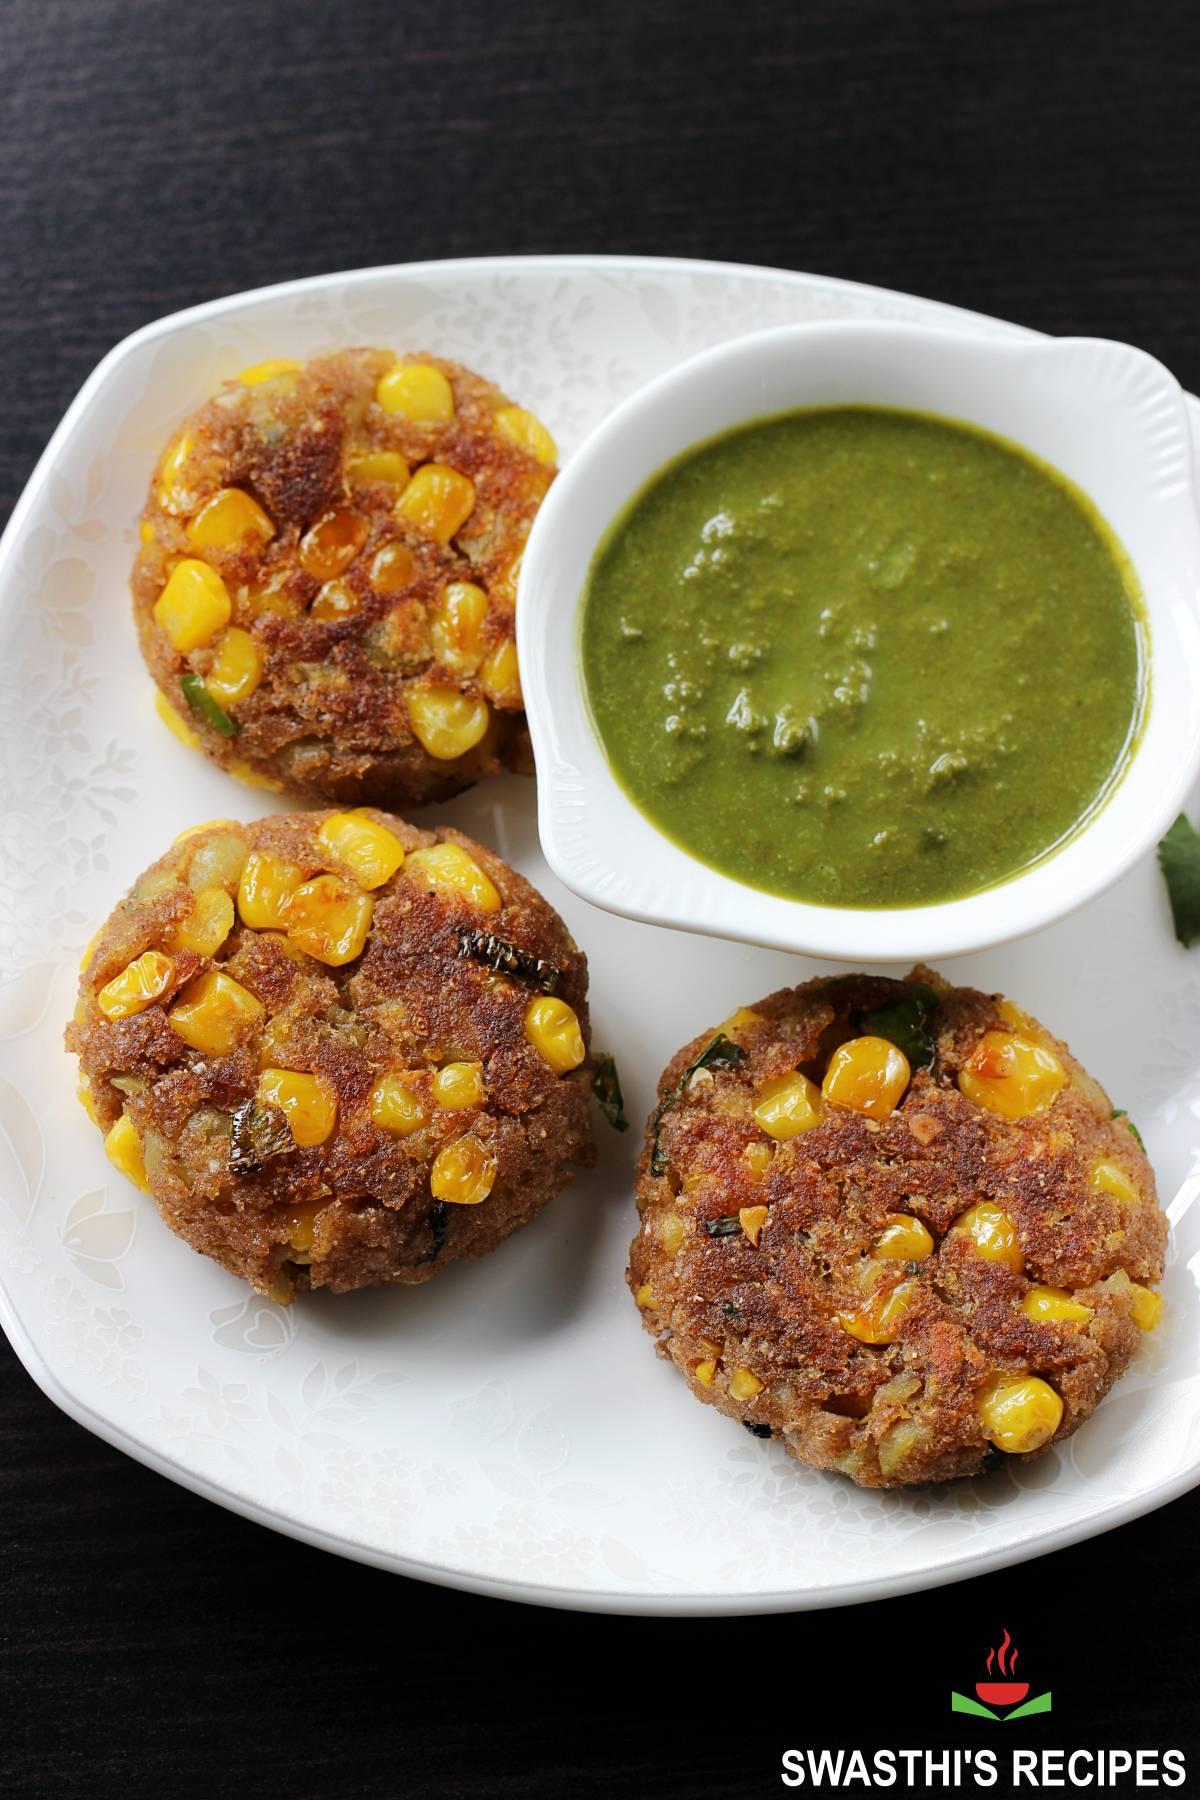 Corn cutlet - Corn patties